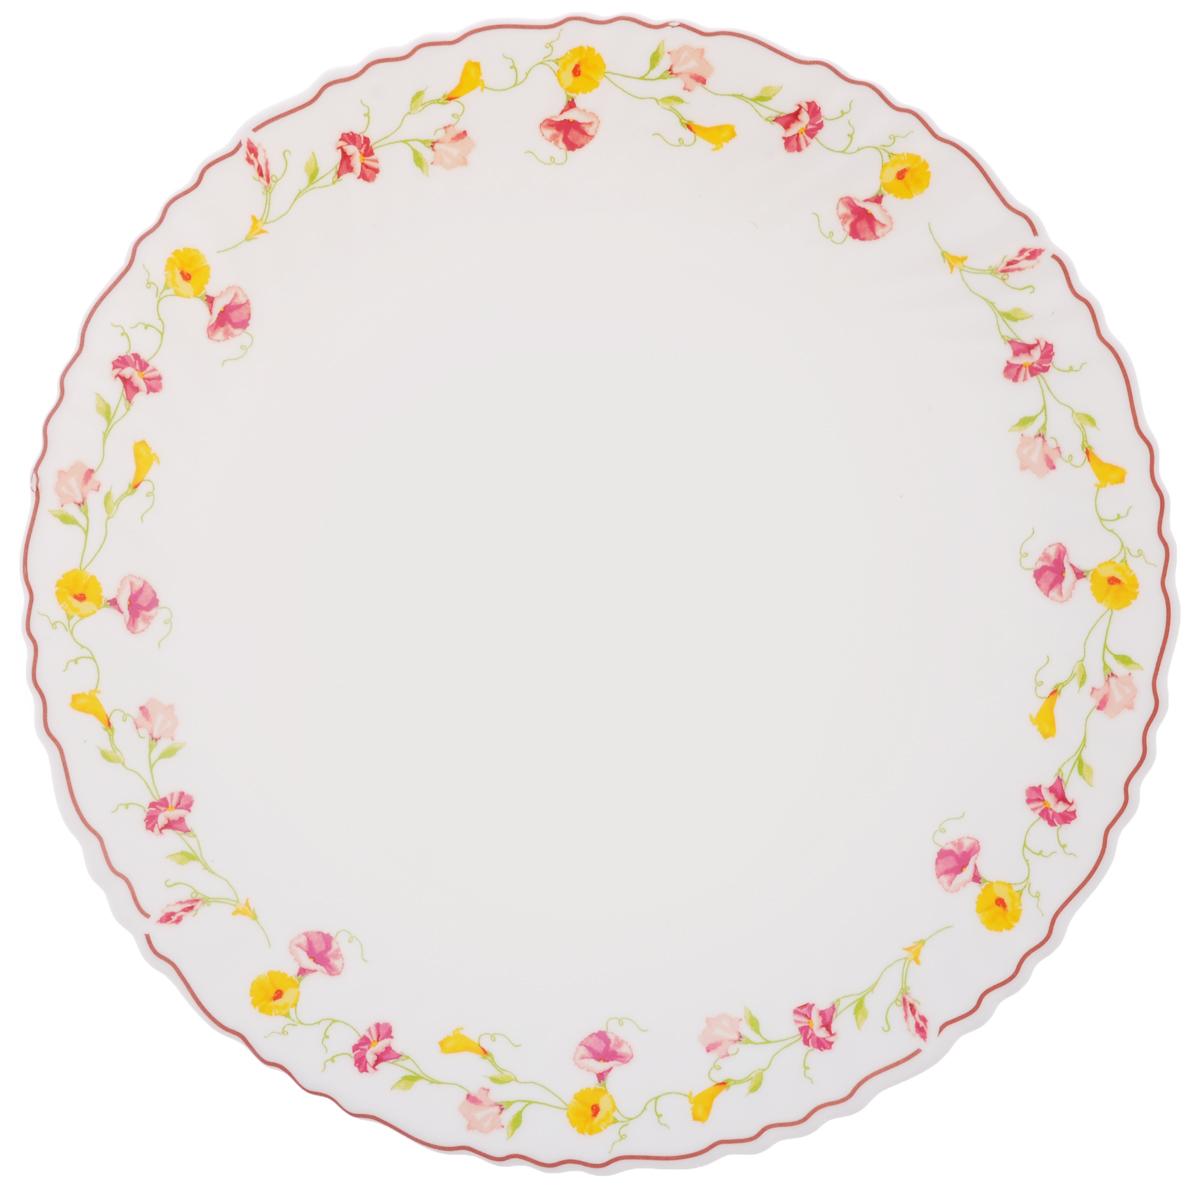 Тарелка обеденная Chinbull Эльзас, диаметр 24 см тарелка глубокая chinbull грация диаметр 23 см